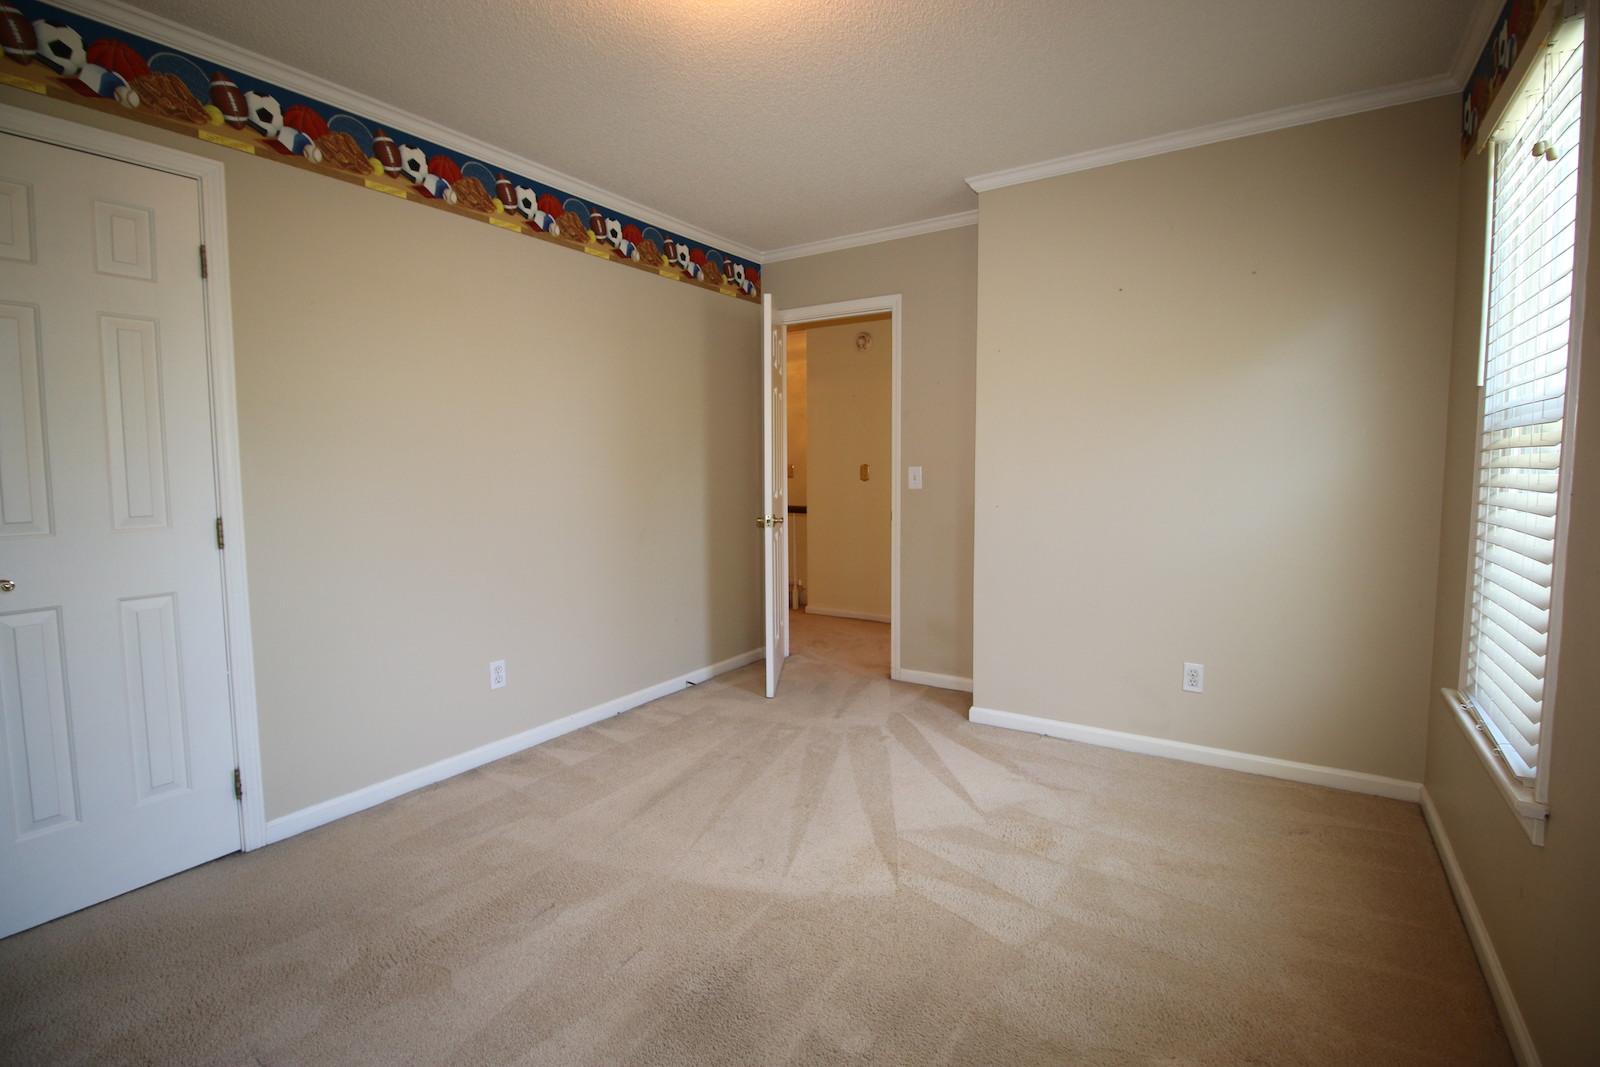 6009 Hampton Leas Lane,Columbia,South Carolina 29209,3 Bedrooms Bedrooms,2.5 BathroomsBathrooms,Home,Hampton Leas Lane,1382